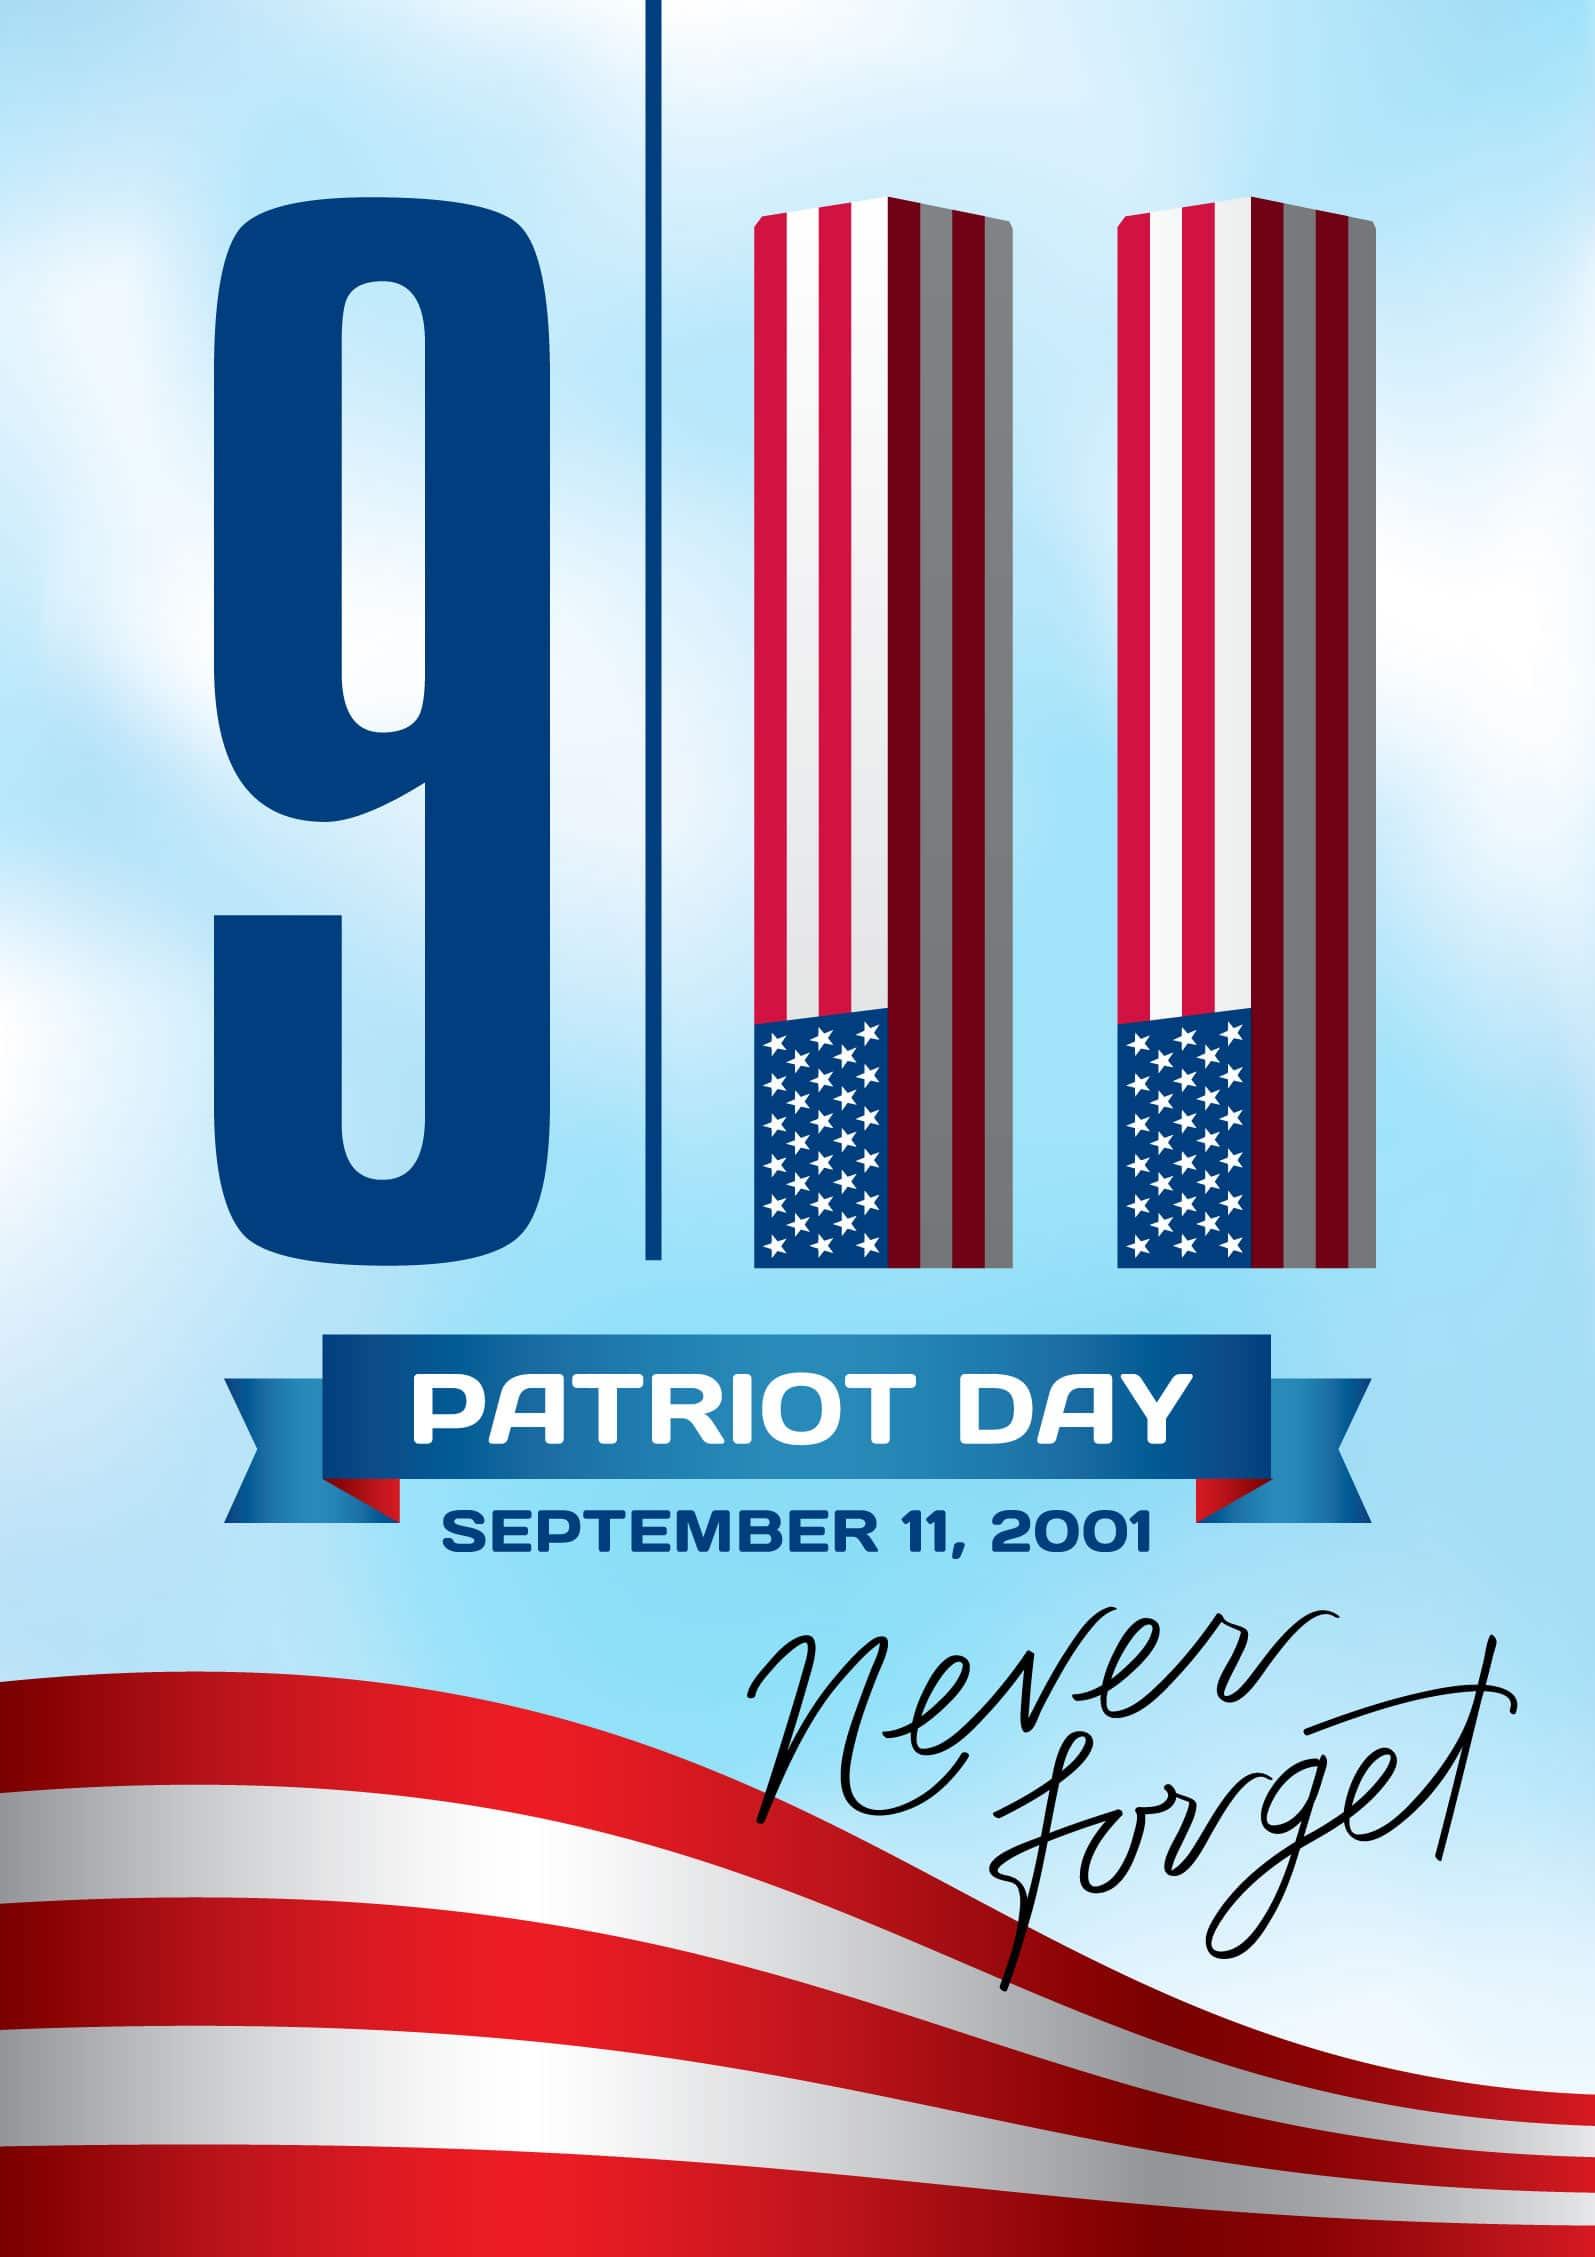 Patriot Day September 11, 2001 Never Forget